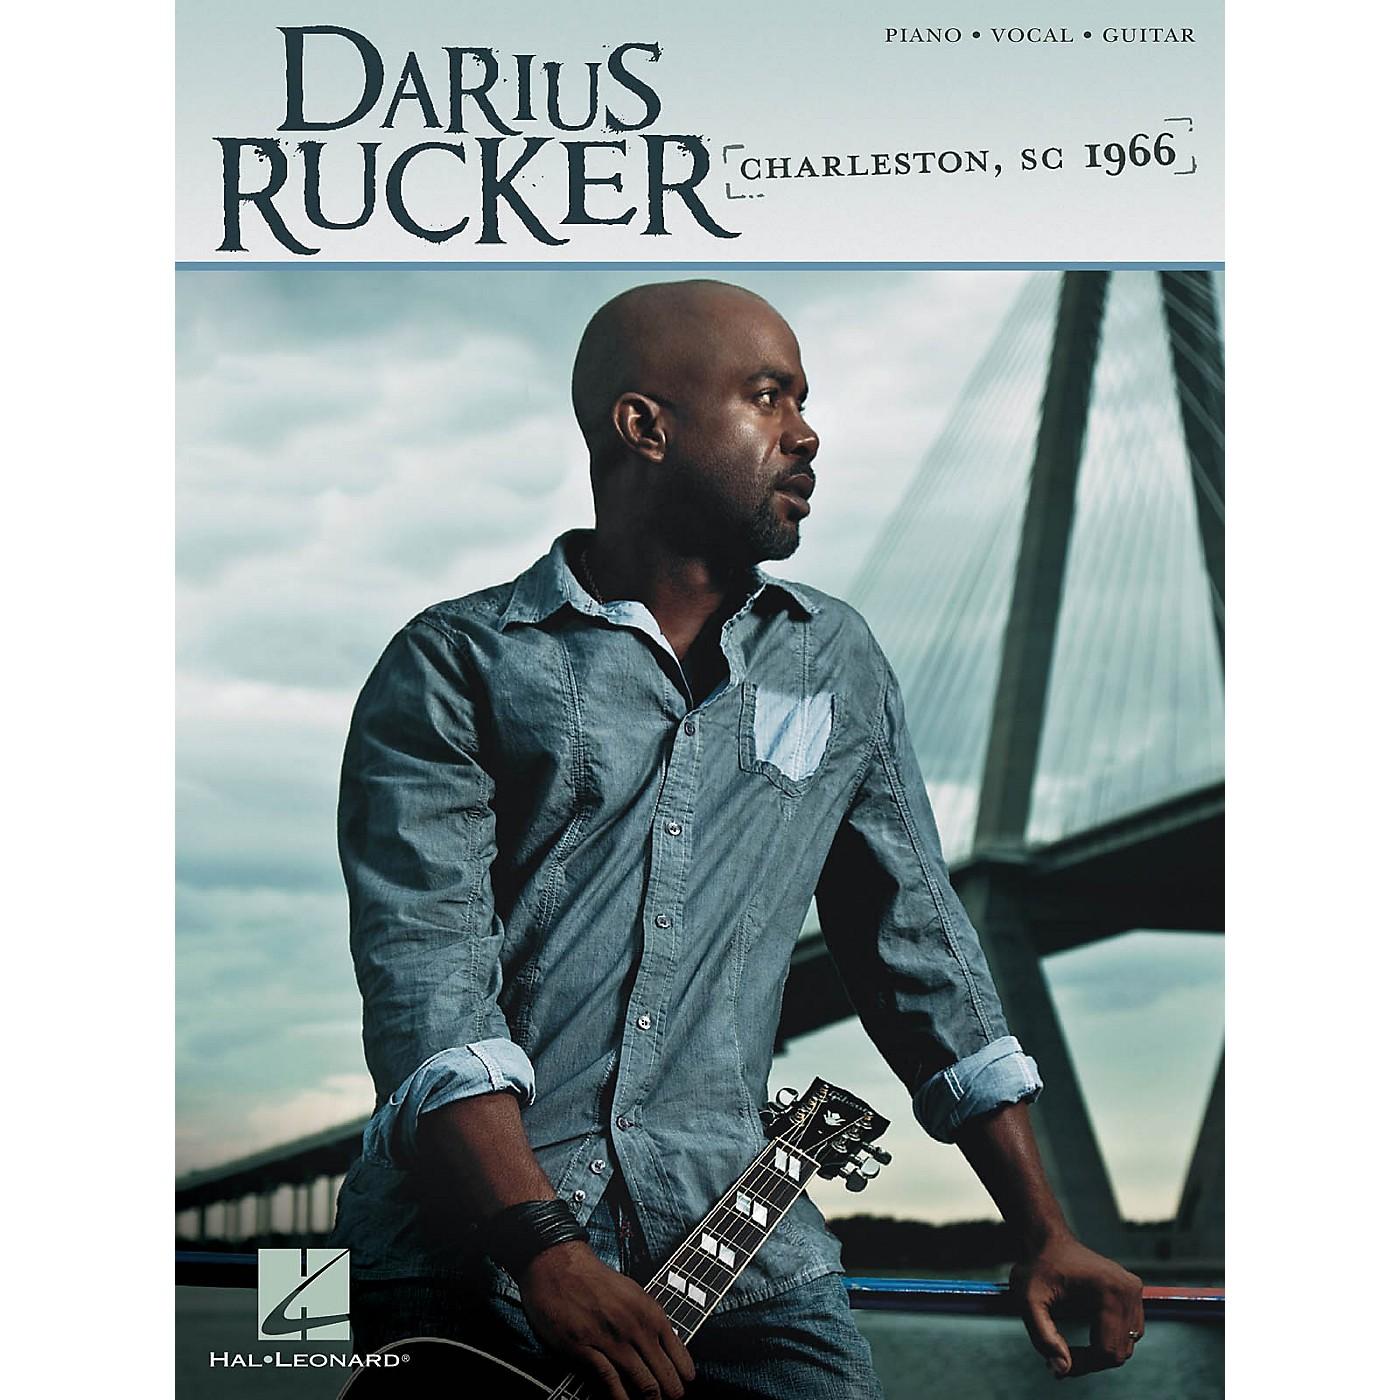 Hal Leonard Darius Rucker - Charleston SC 1966 PVG Songbook thumbnail